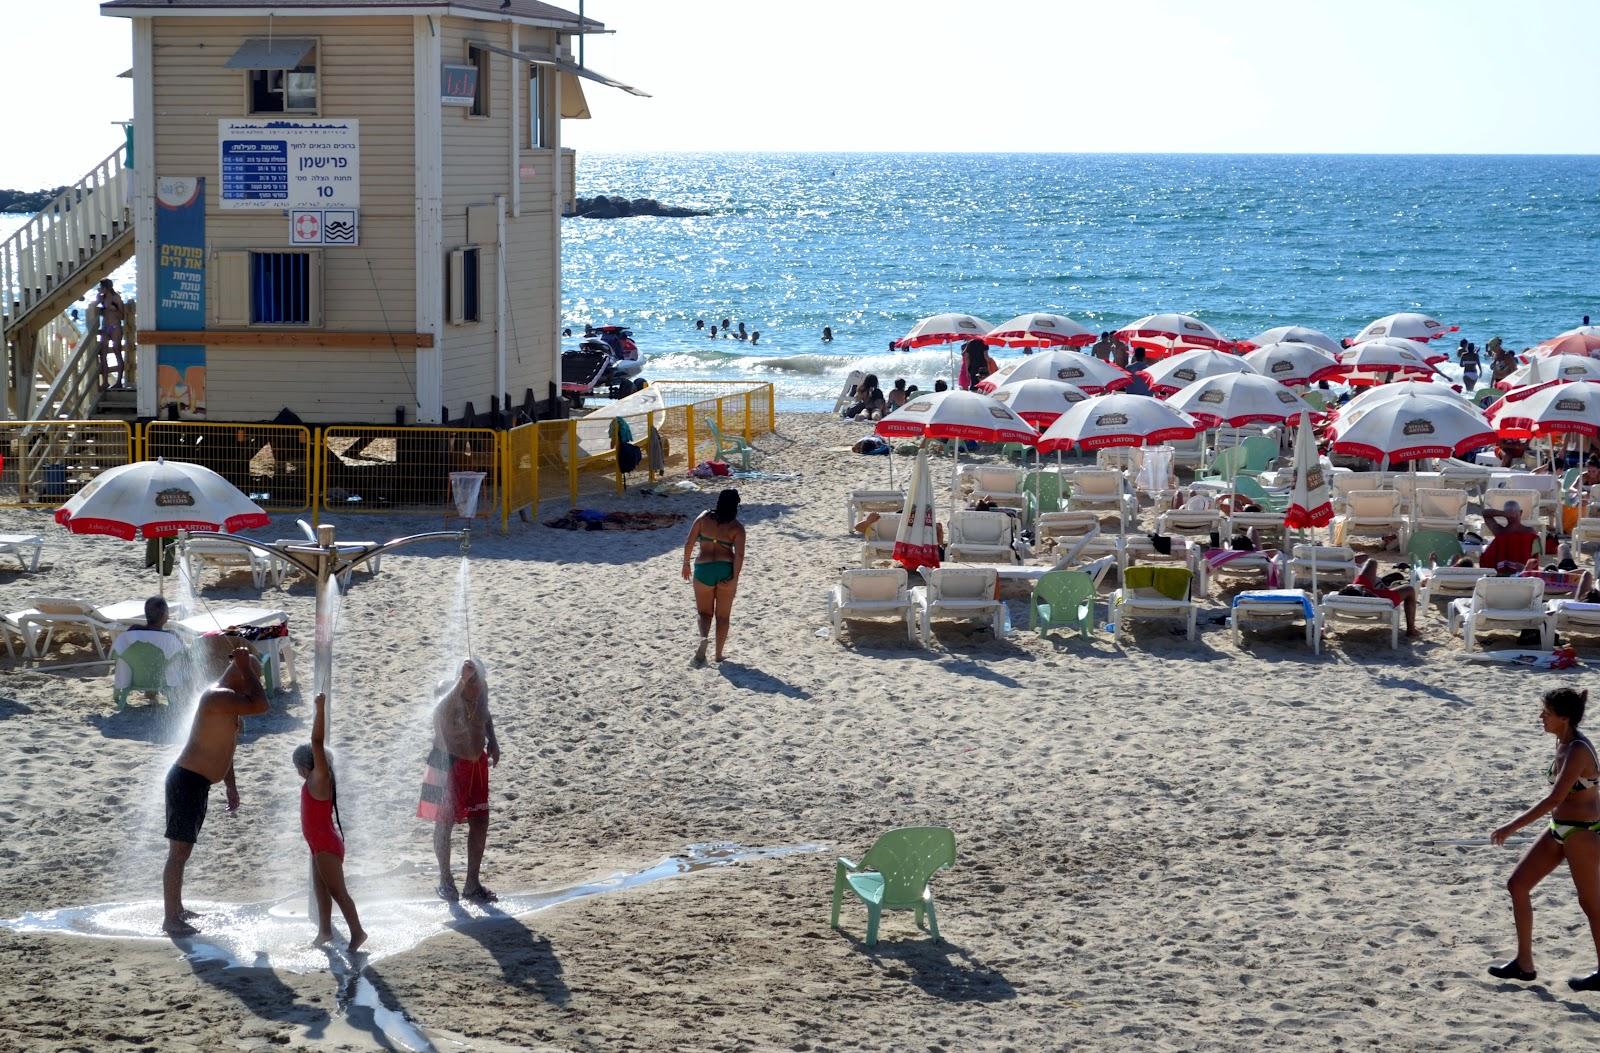 plages israel, FRISHMAN  beach, plage tel aviv